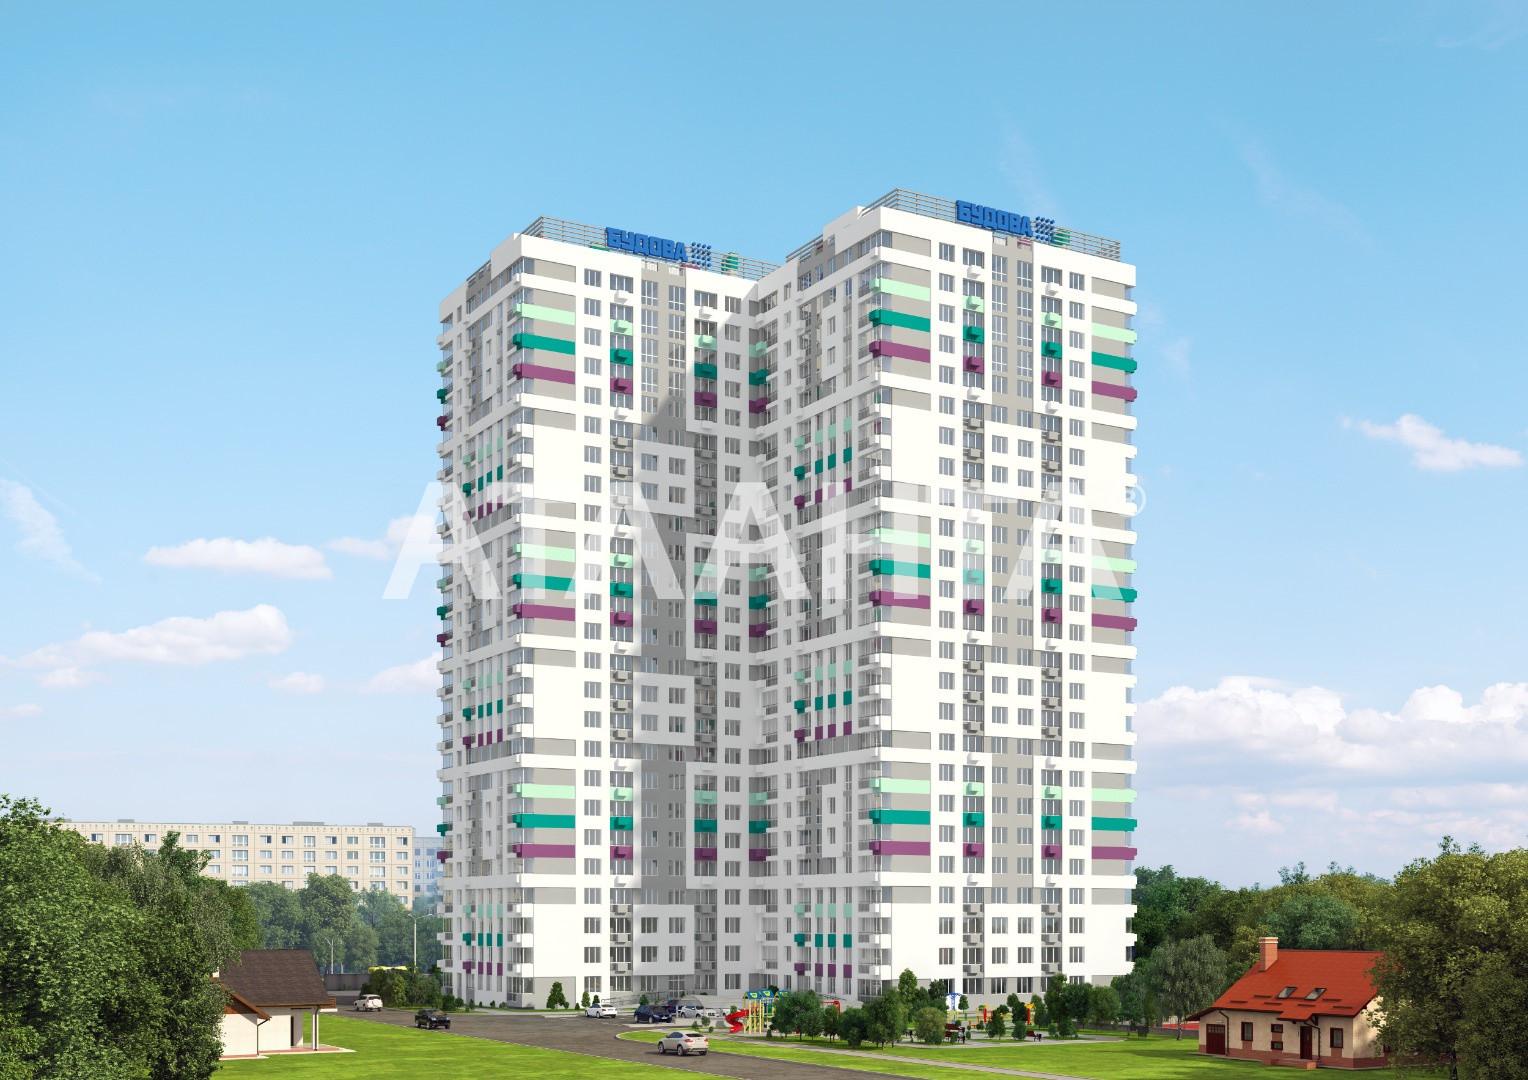 Продается 1-комнатная Квартира на ул. Костанди — 36 600 у.е.